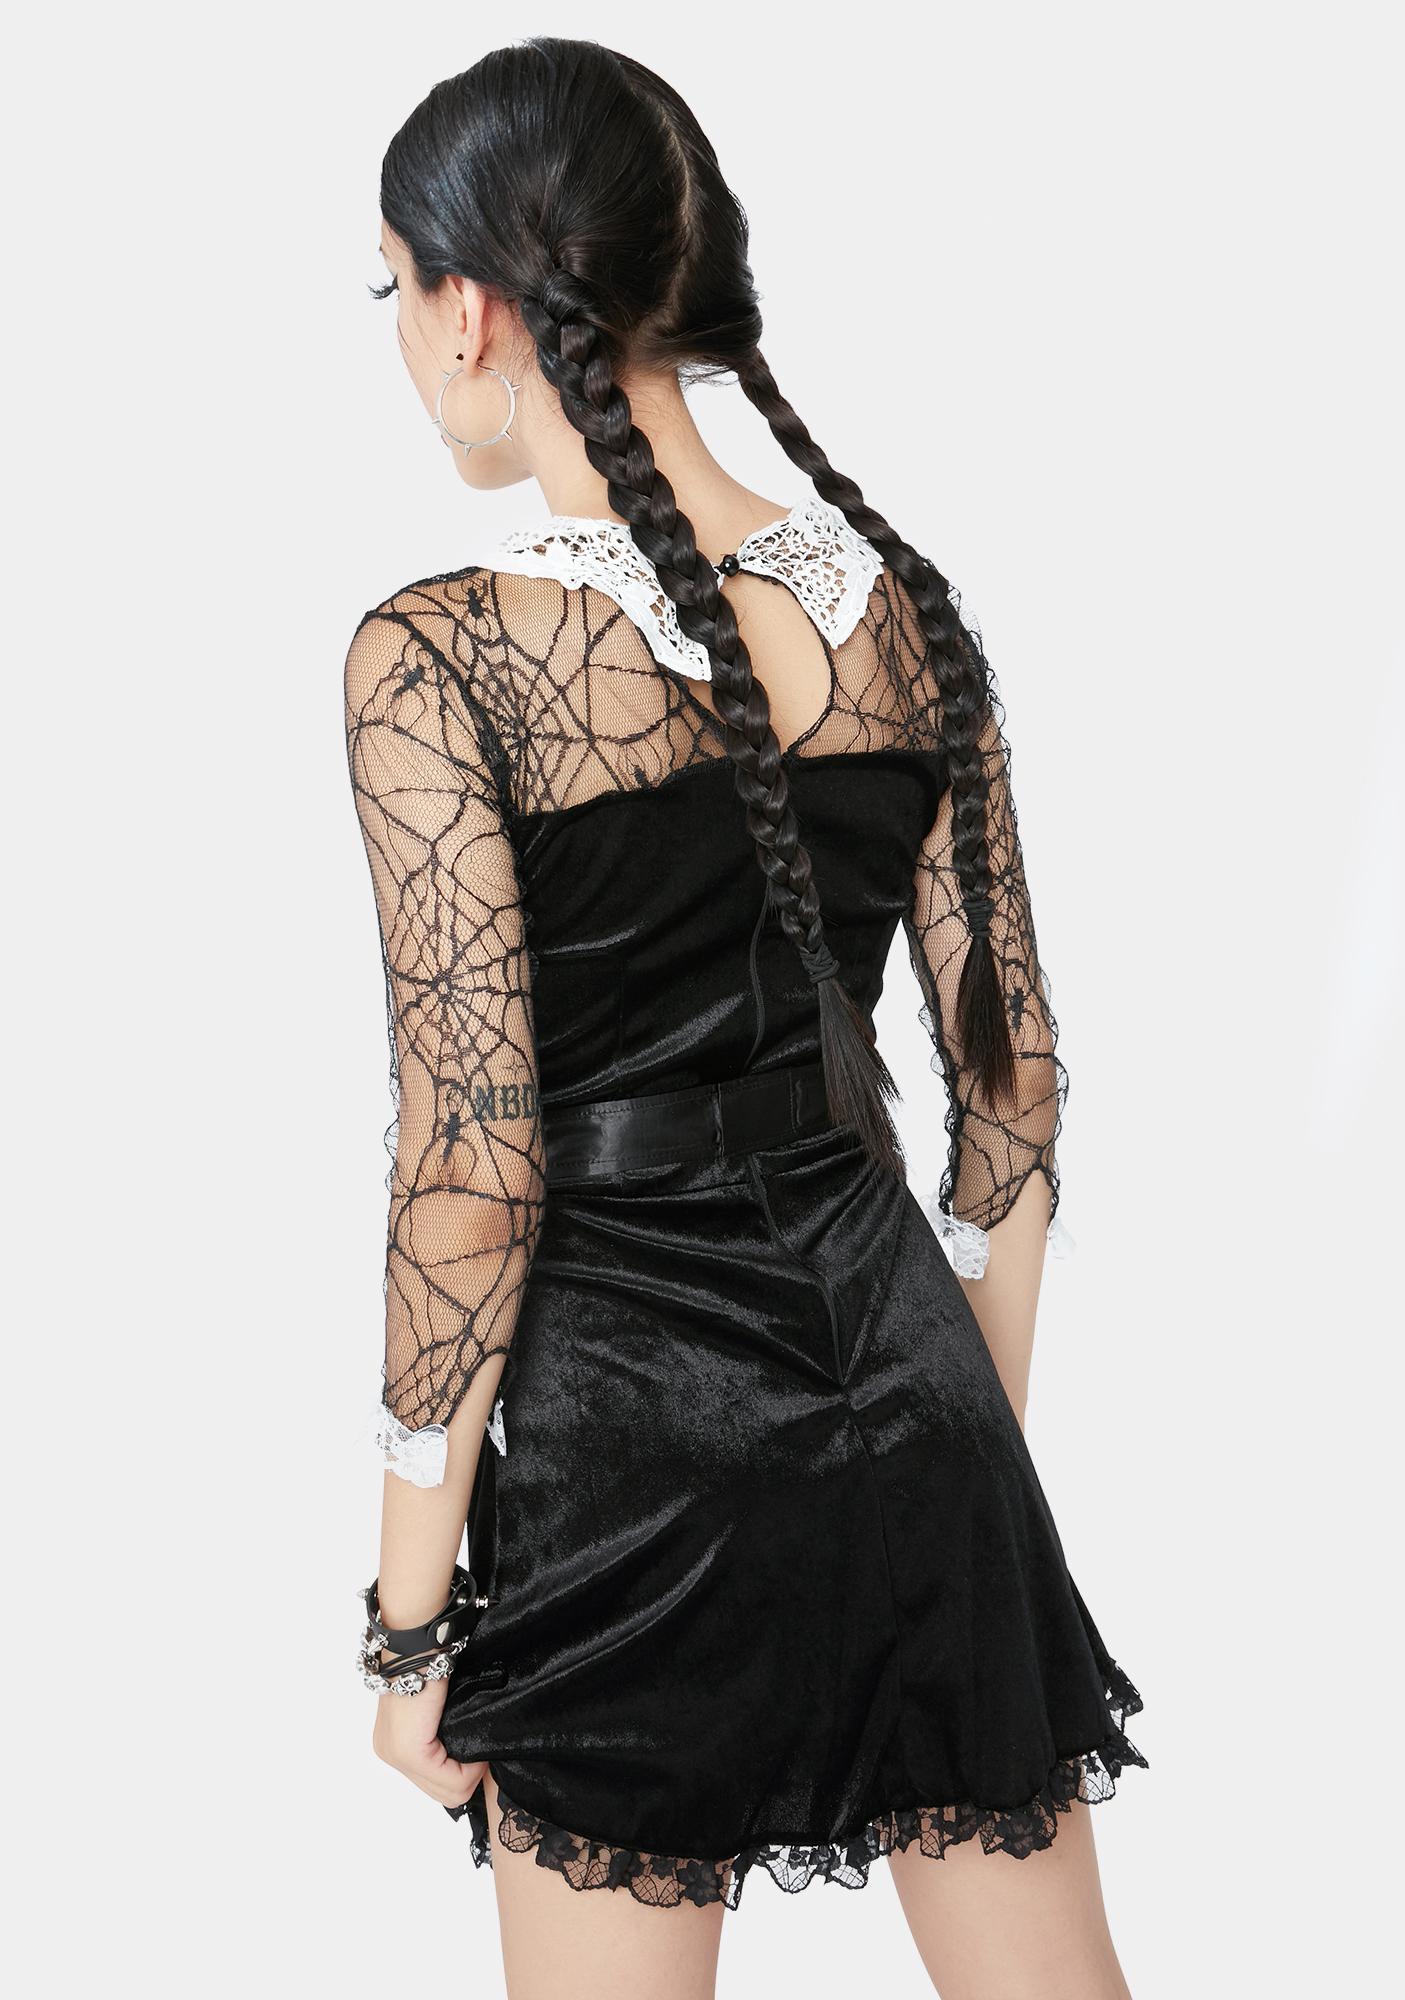 Hump Day Hottie Costume